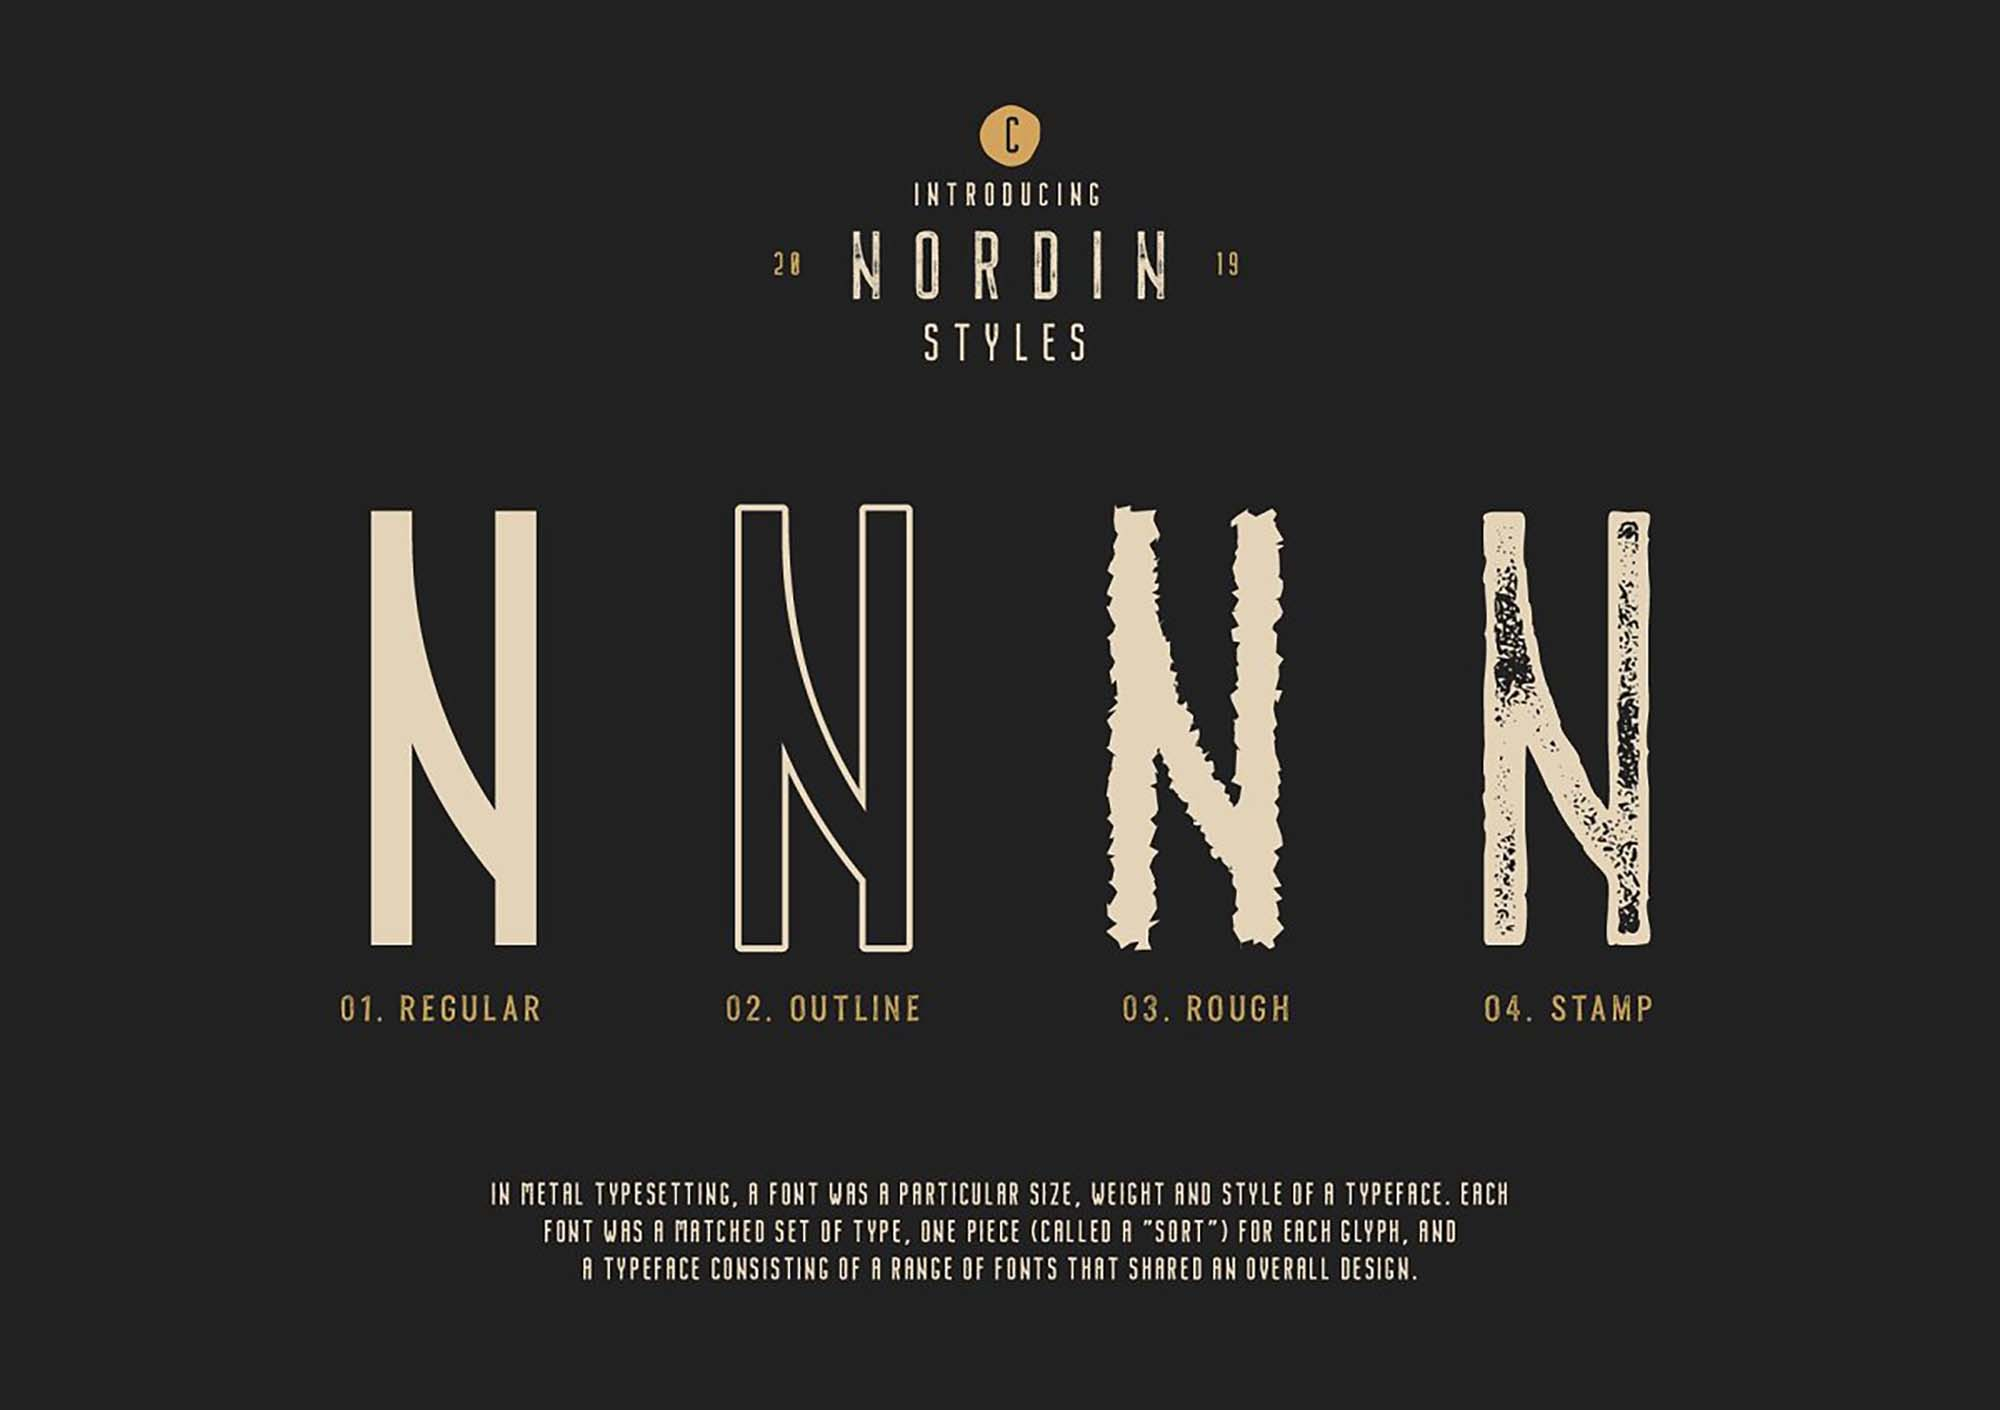 Nordin Vintage Font Styles